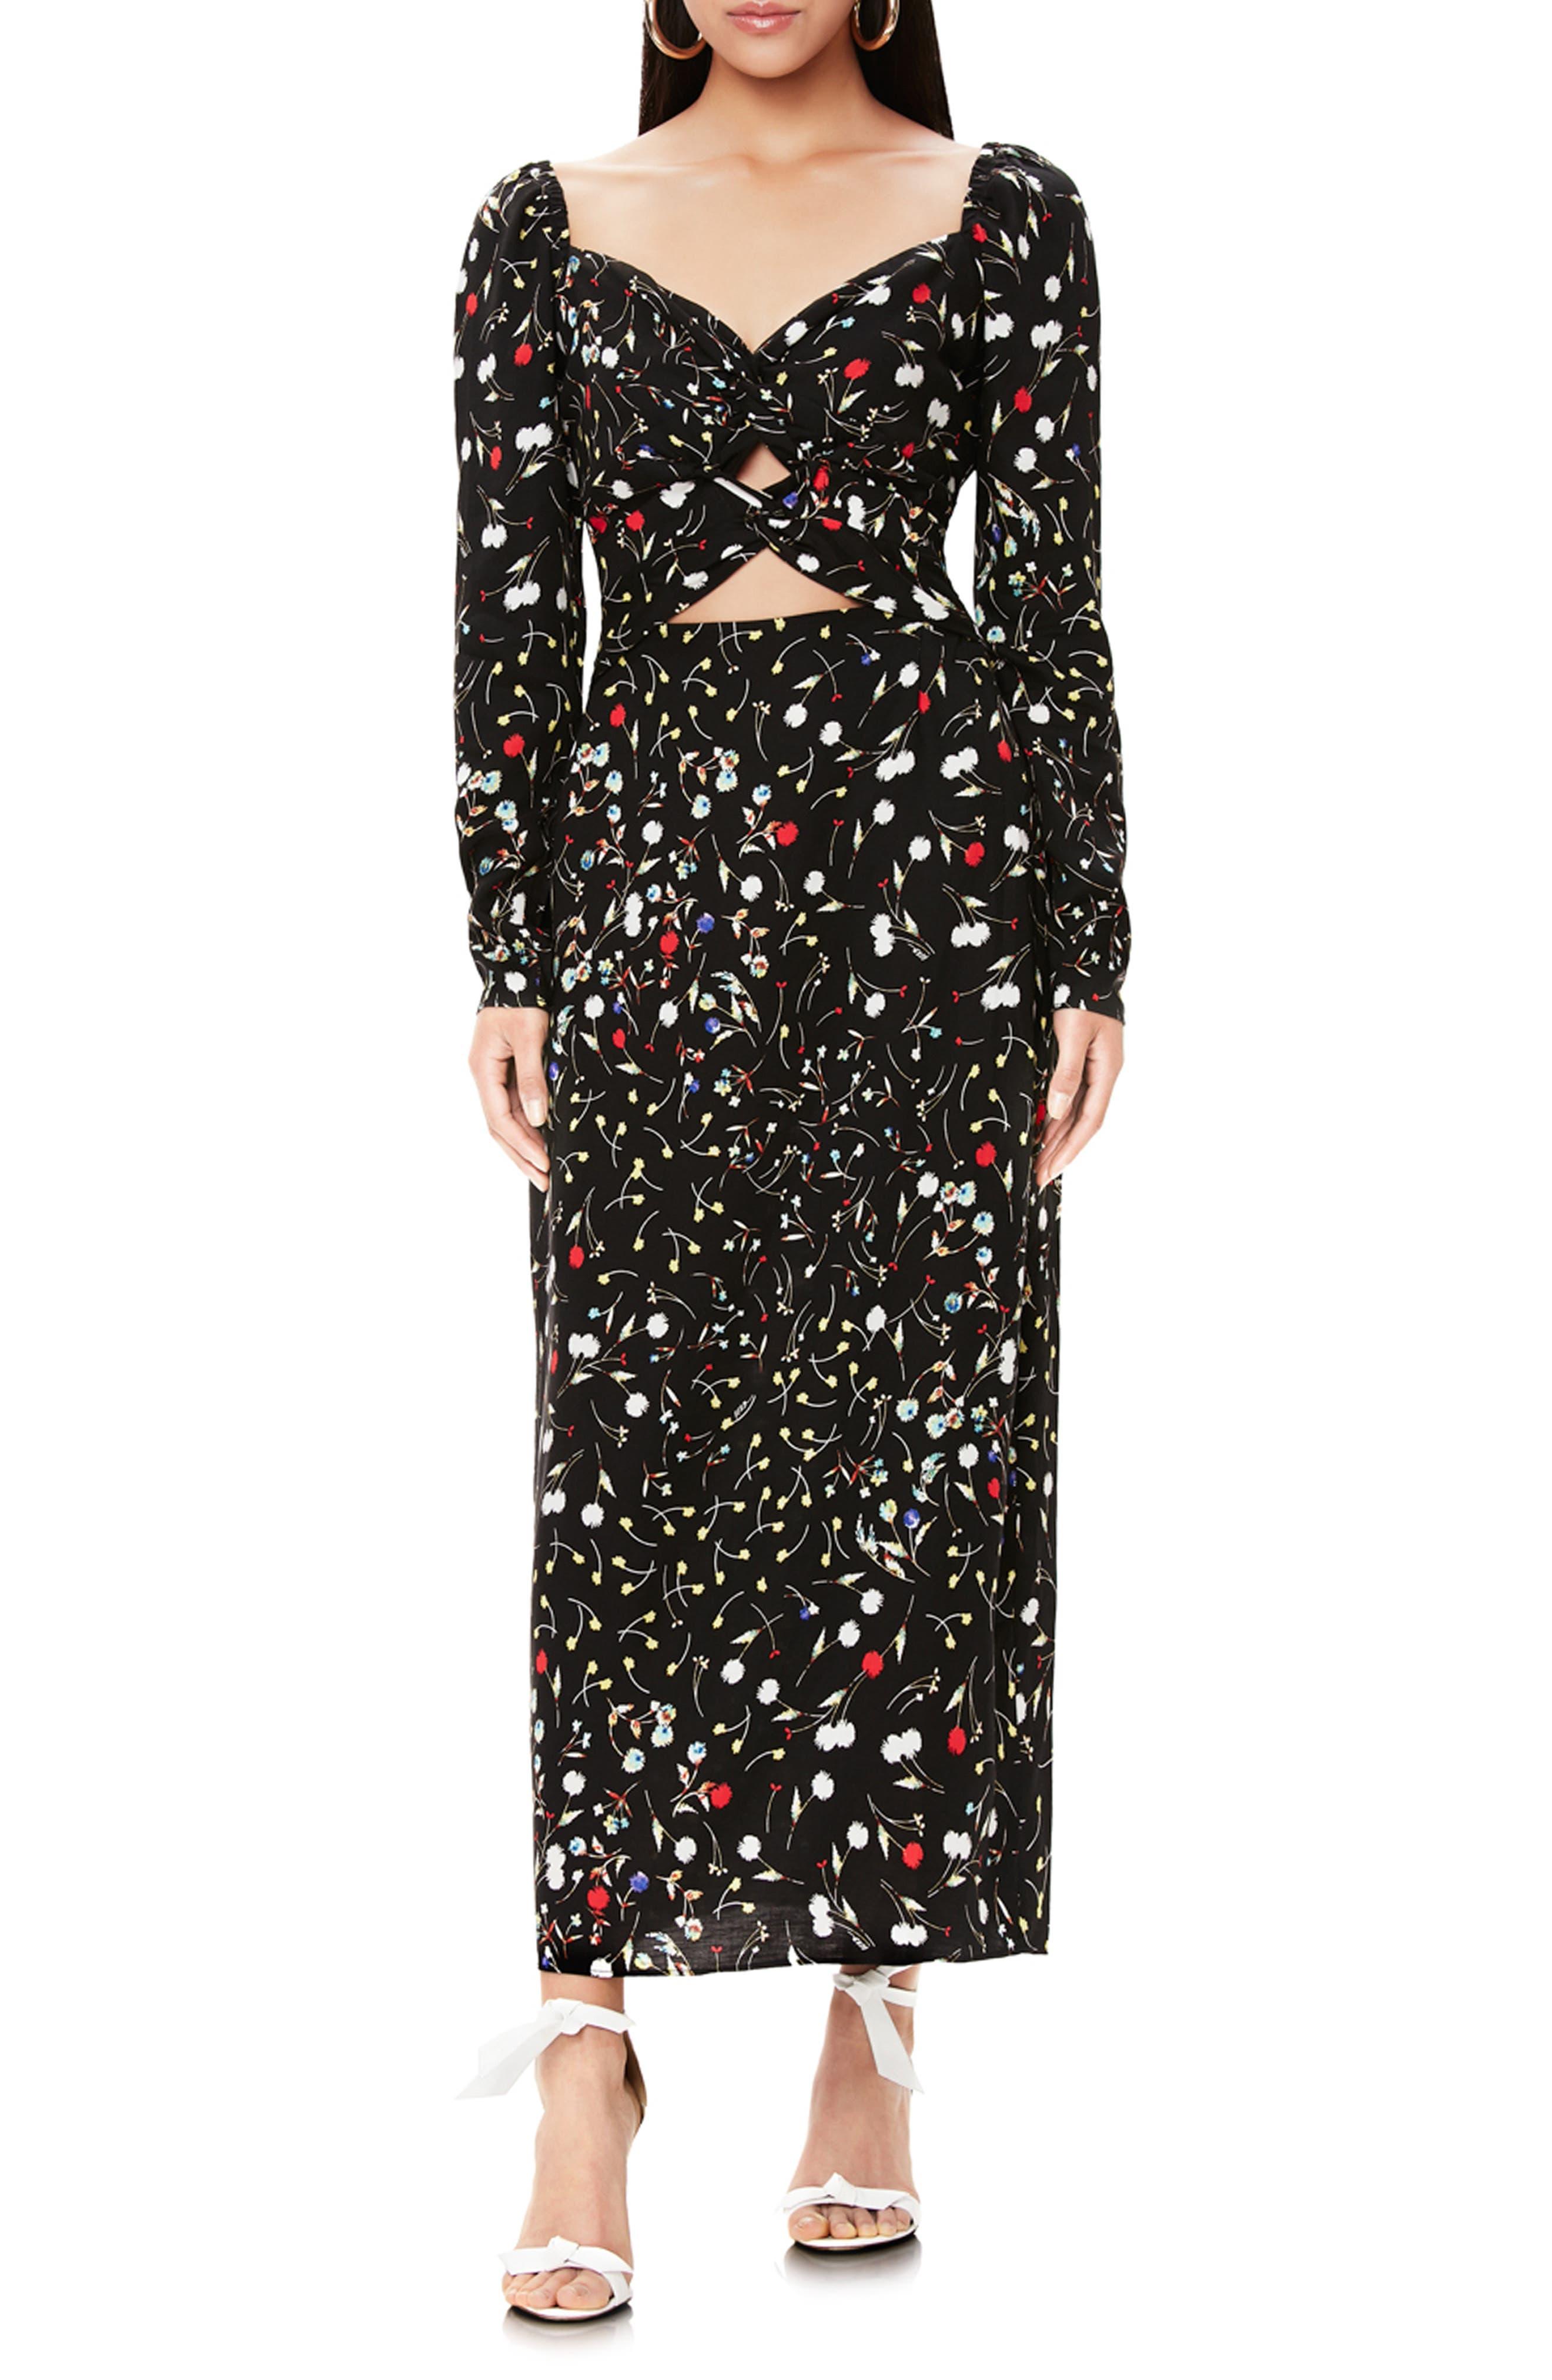 Afrm Floral Print Double Knot Cutout Long Sleeve Maxi Dress, Black